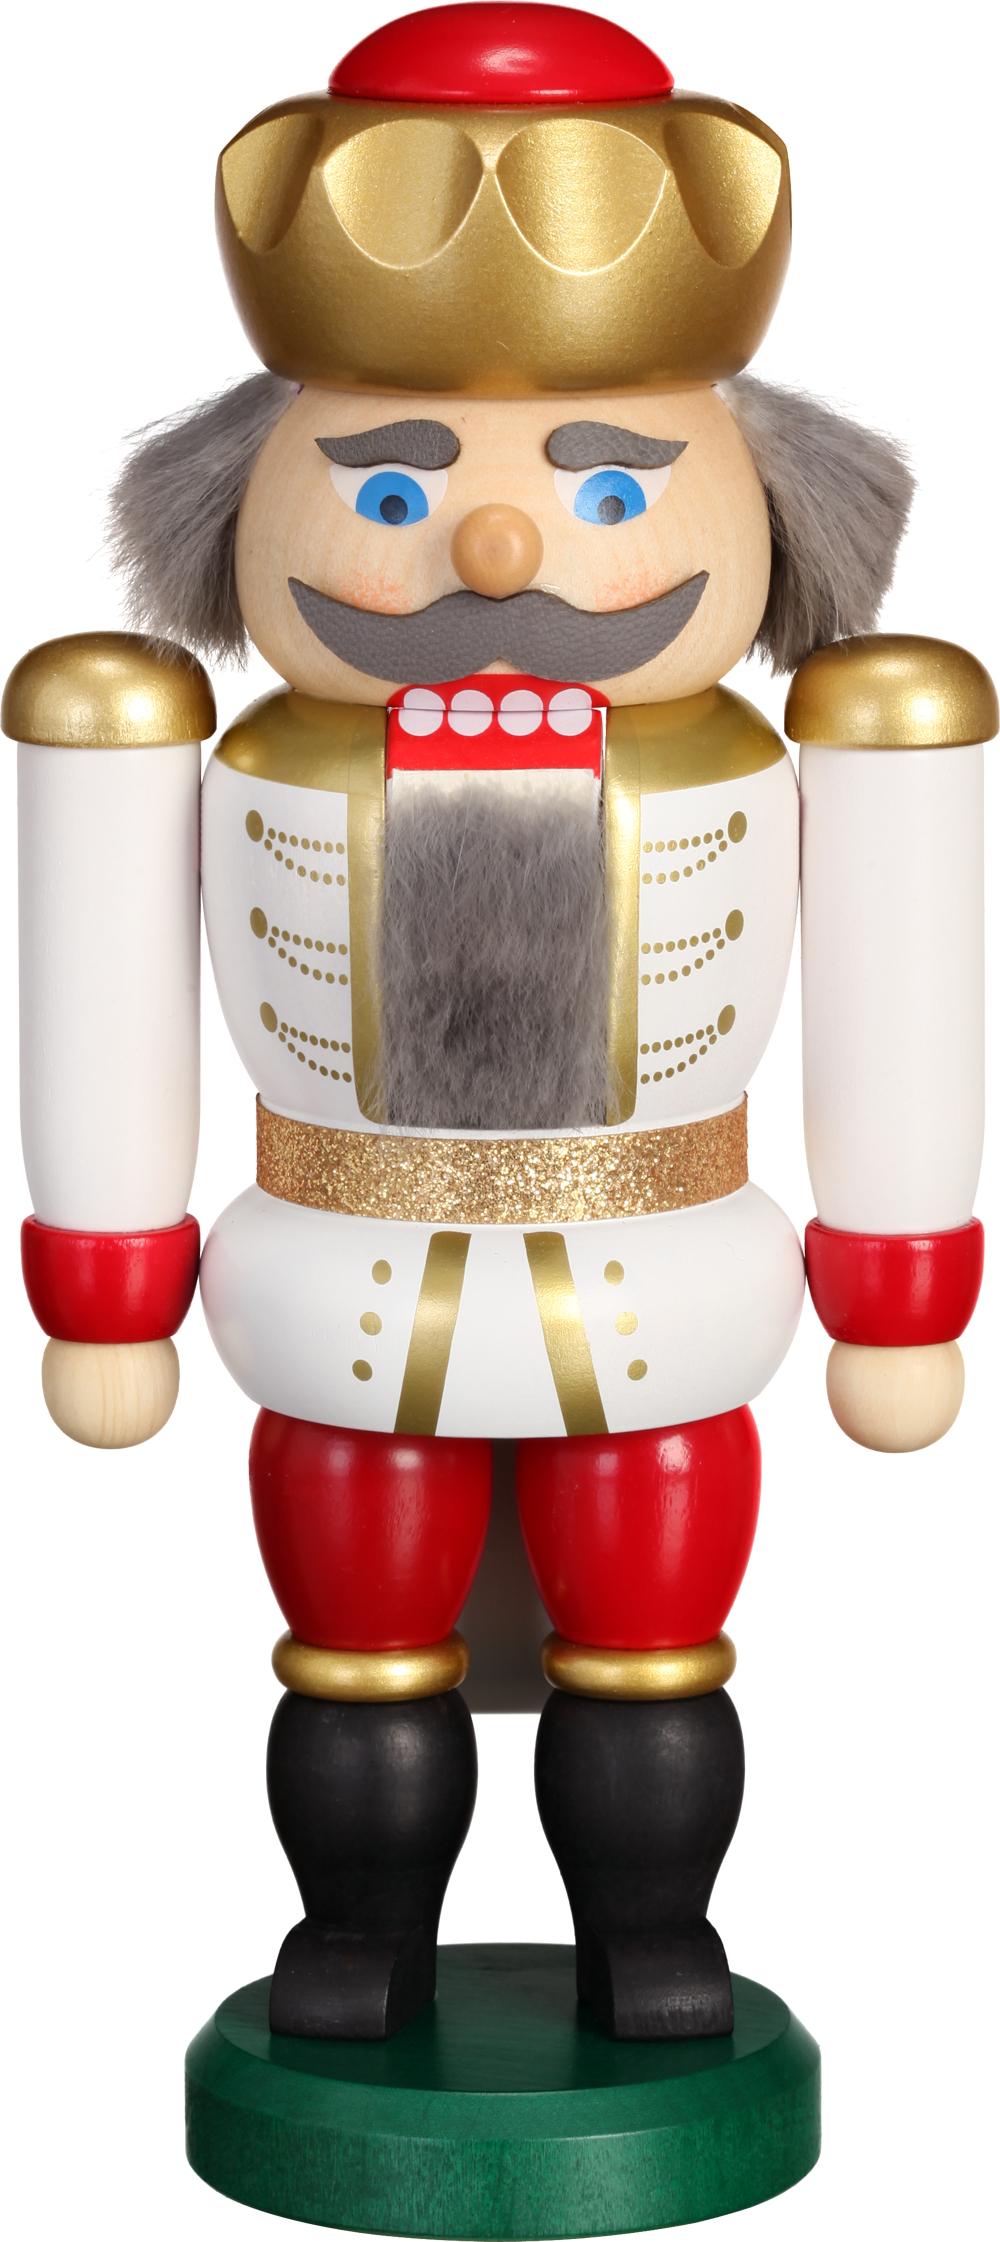 Nussknacker Exklusiv König weiß-rot